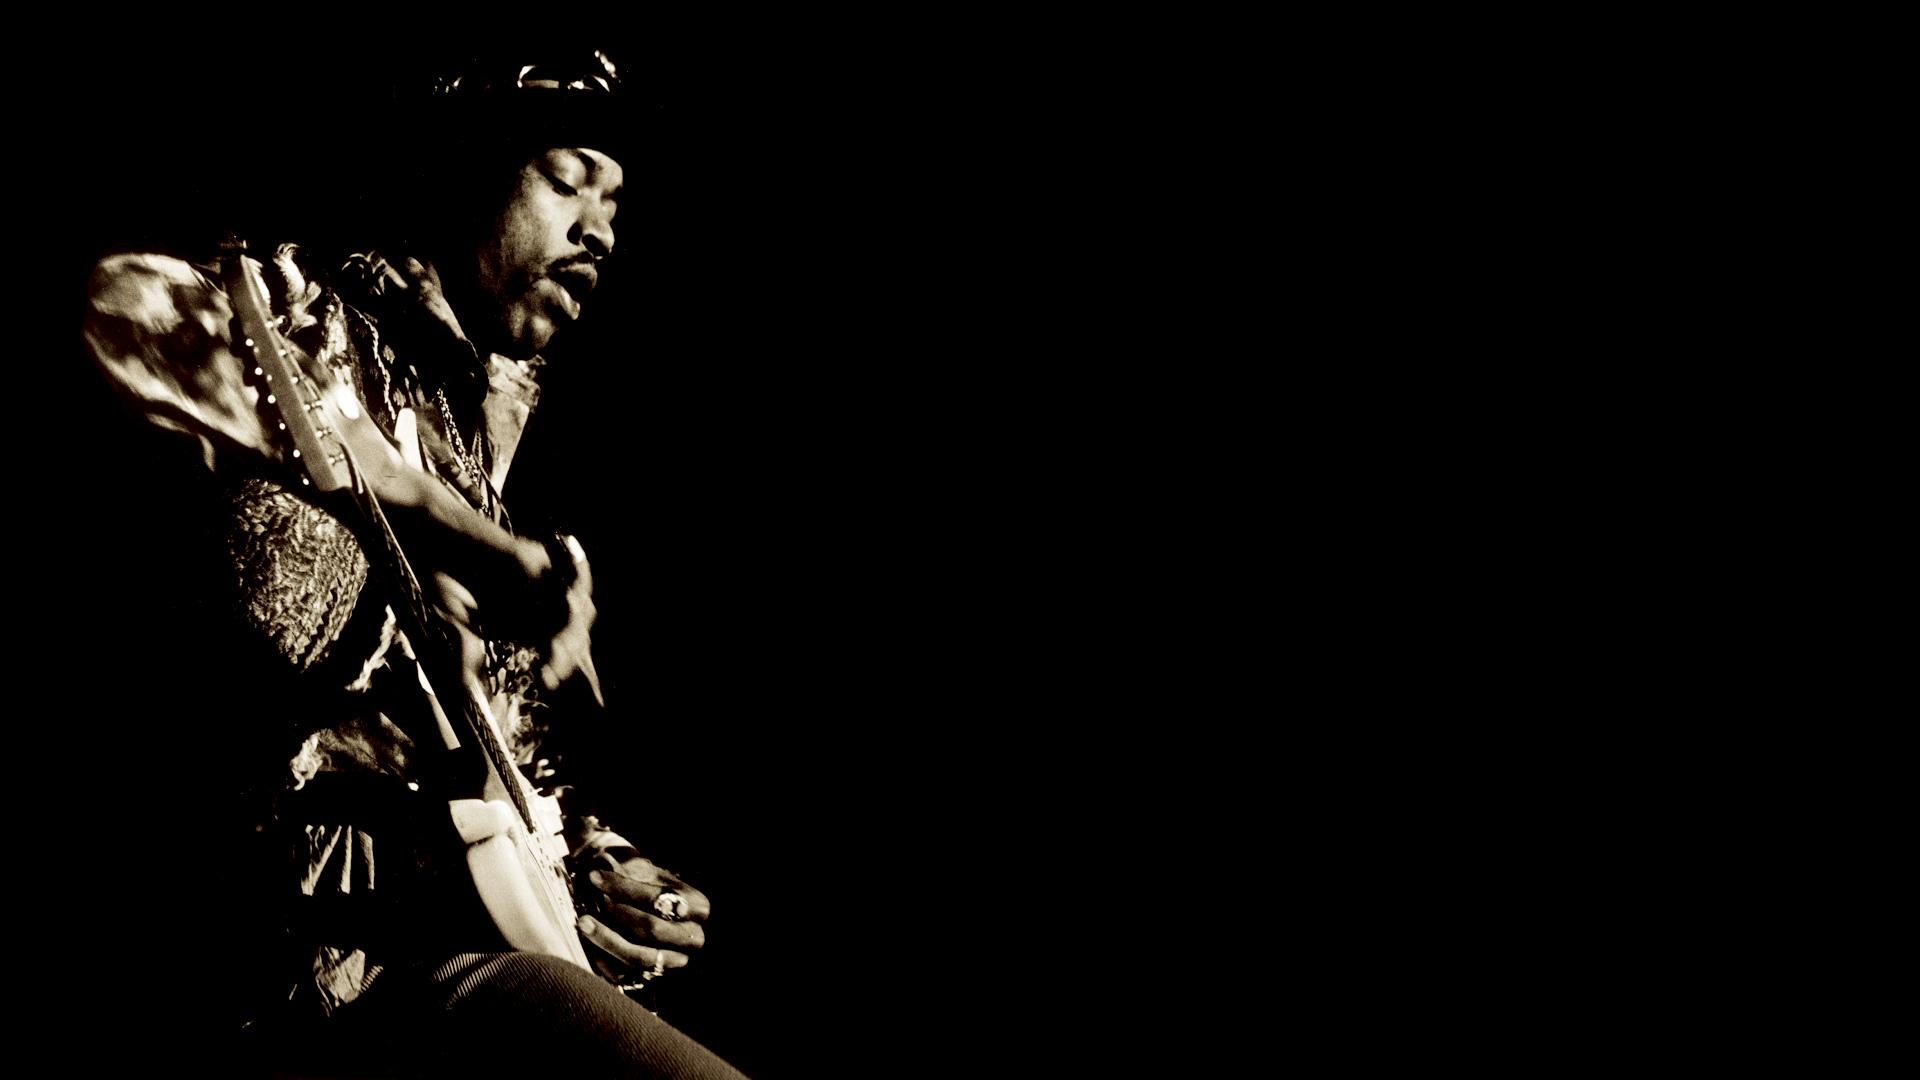 guitar wallpaper widescreen - photo #24